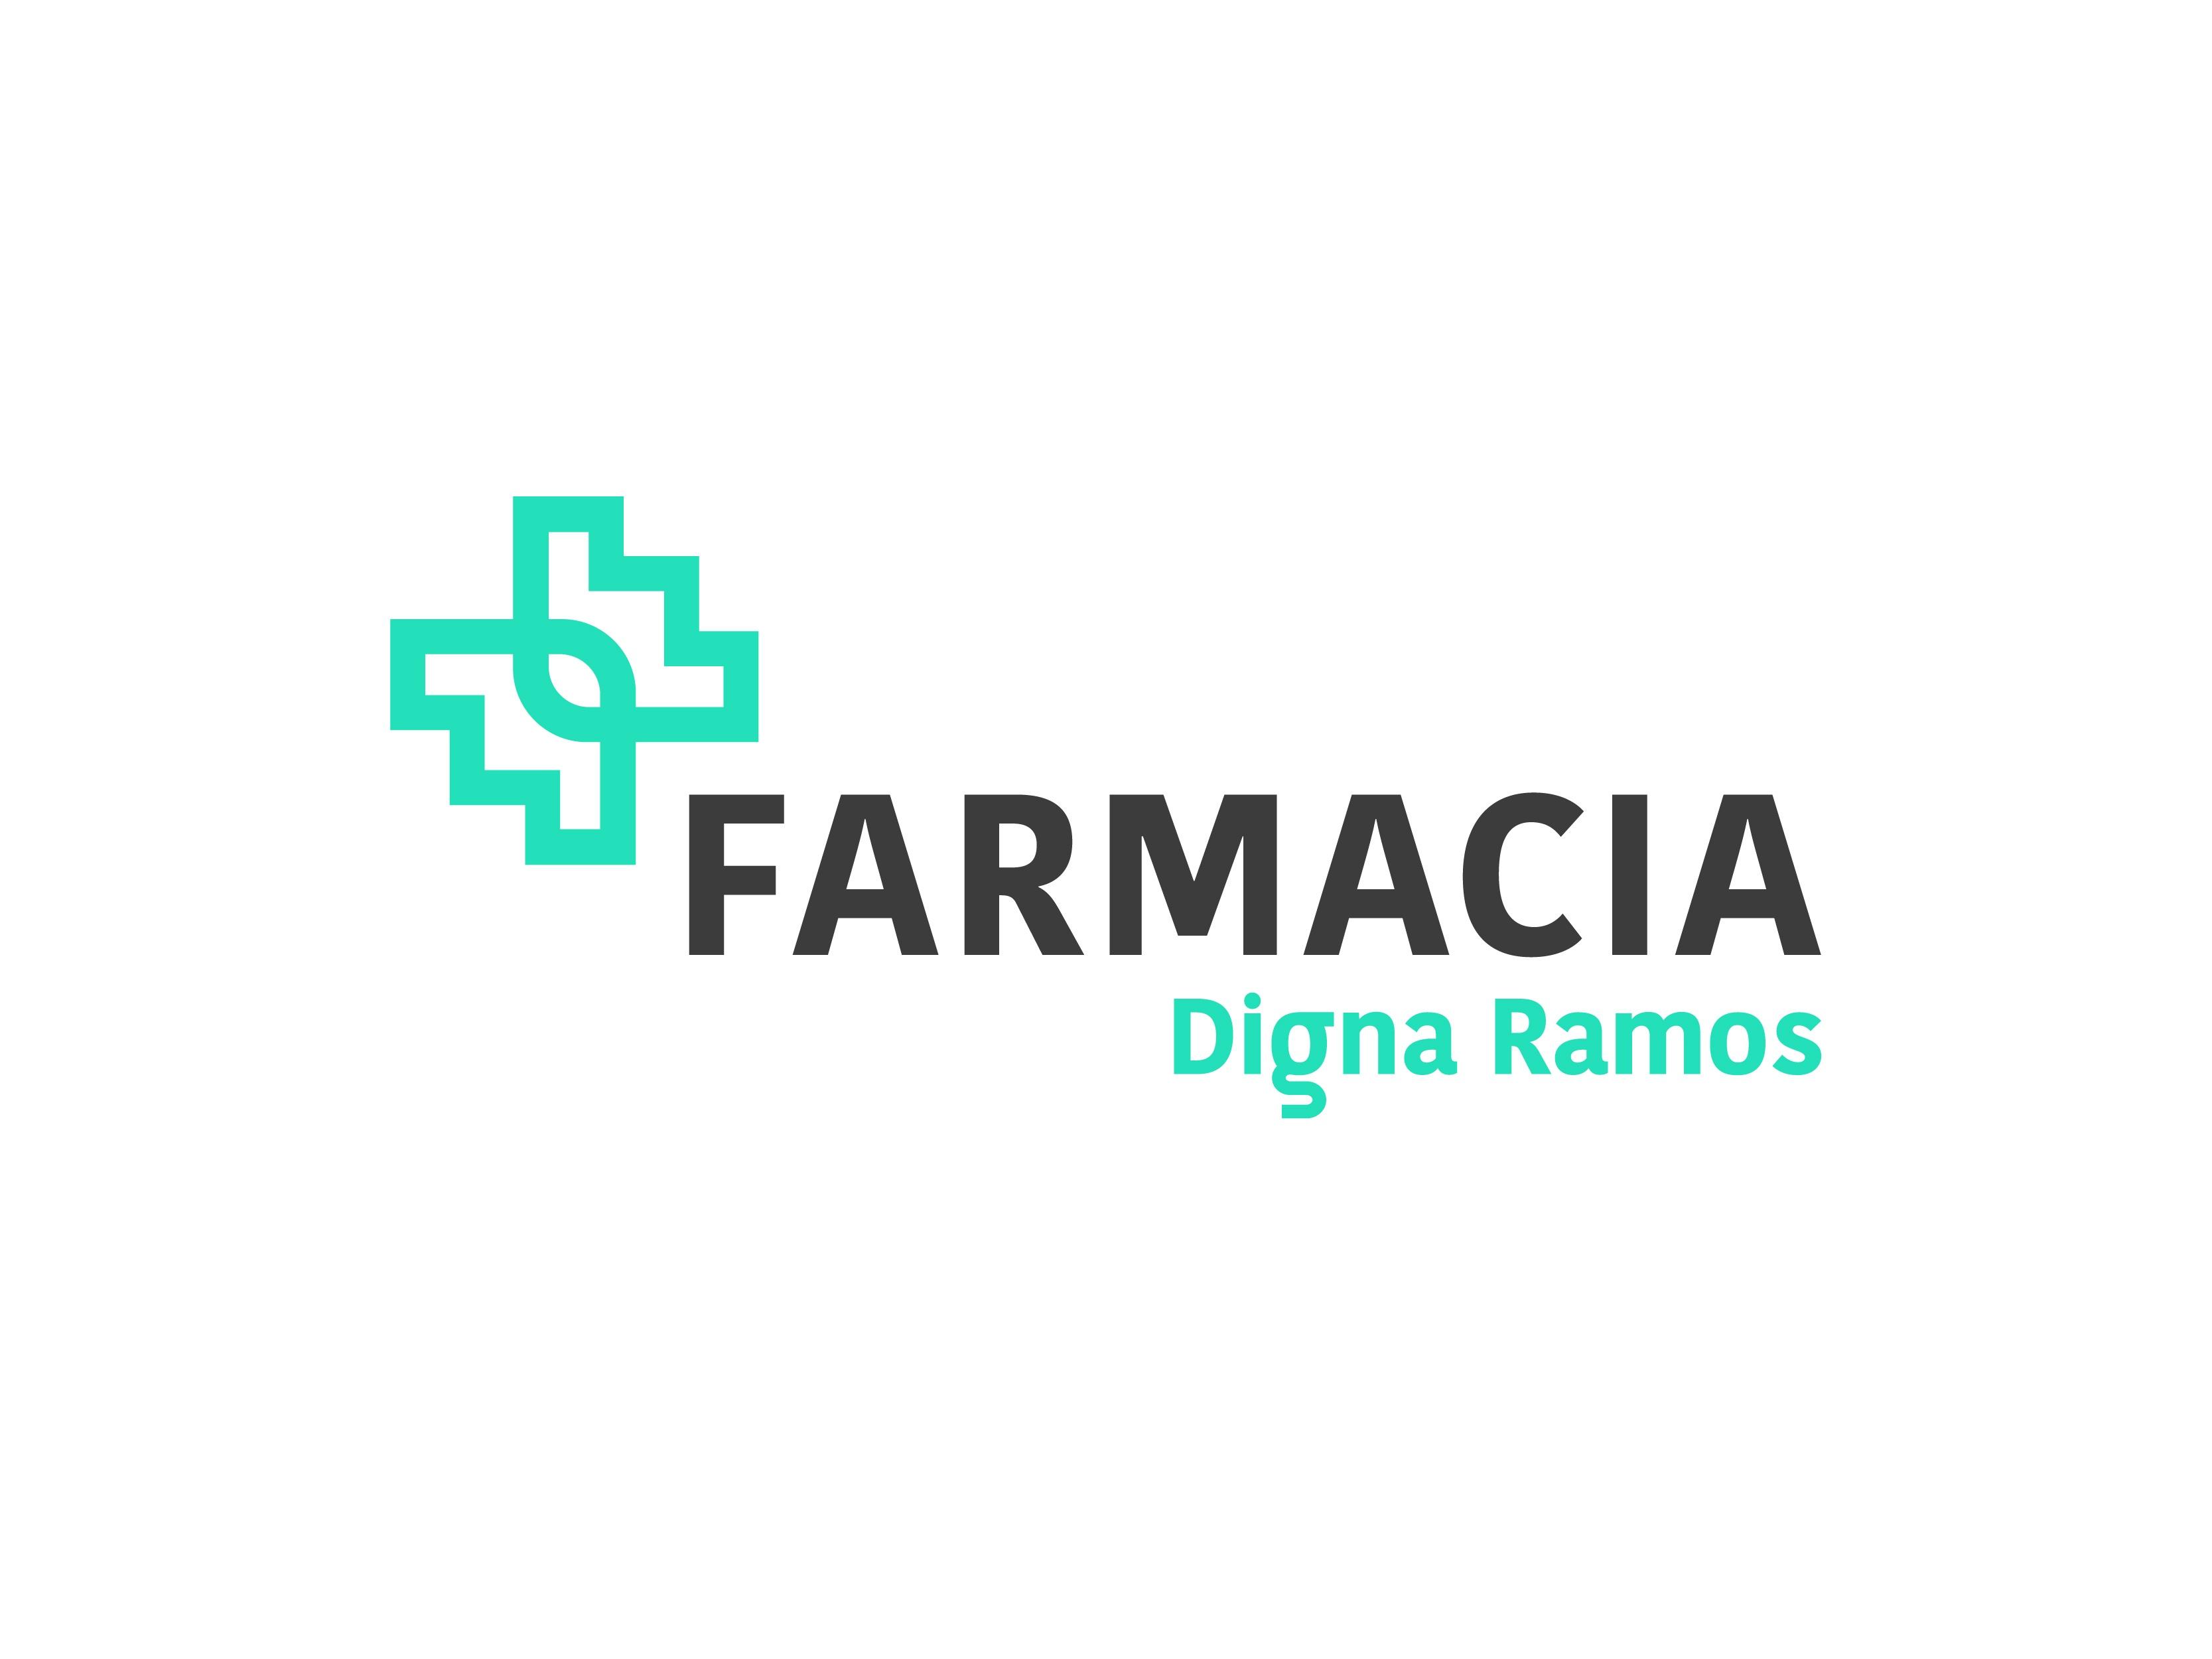 FARMACIA DIGNA RAMOS MORELLA